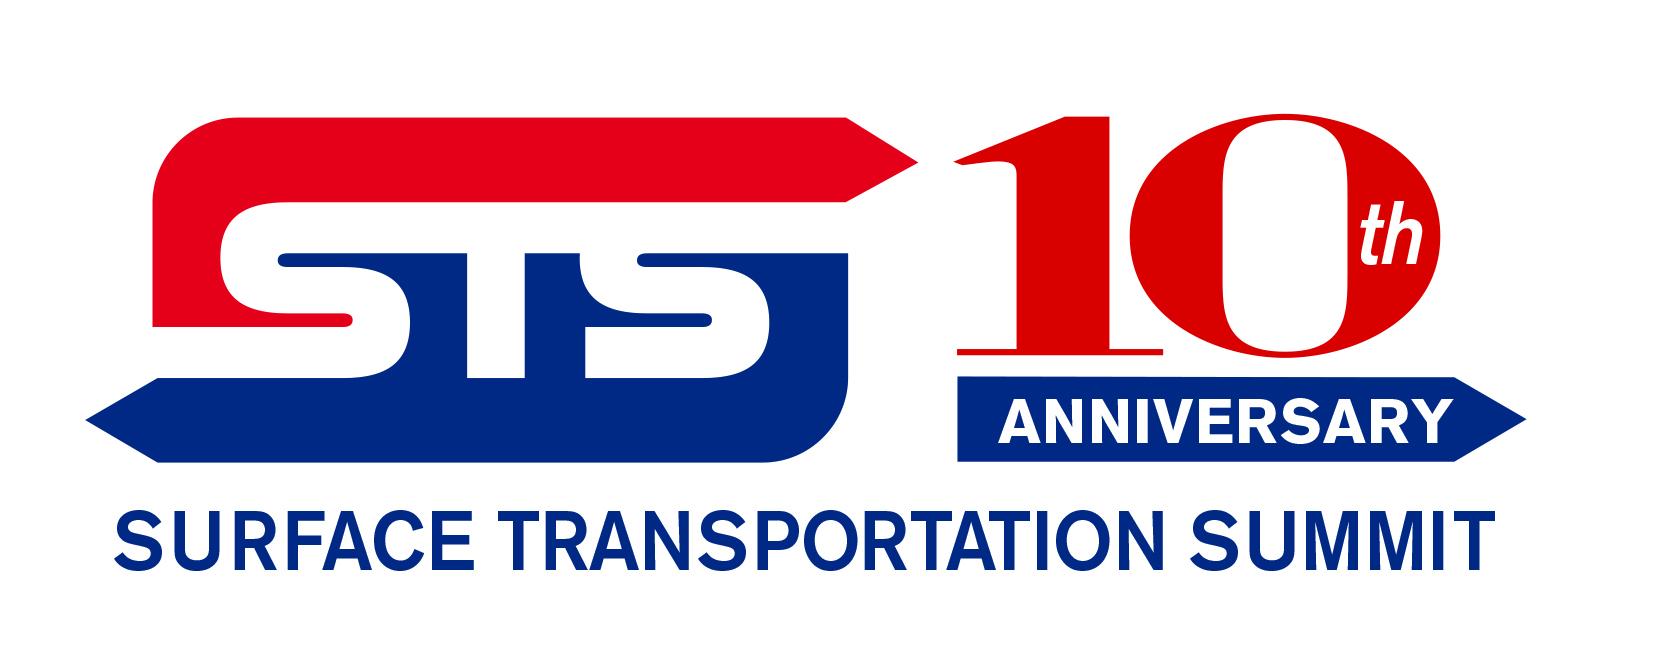 Surface Transportation Summit